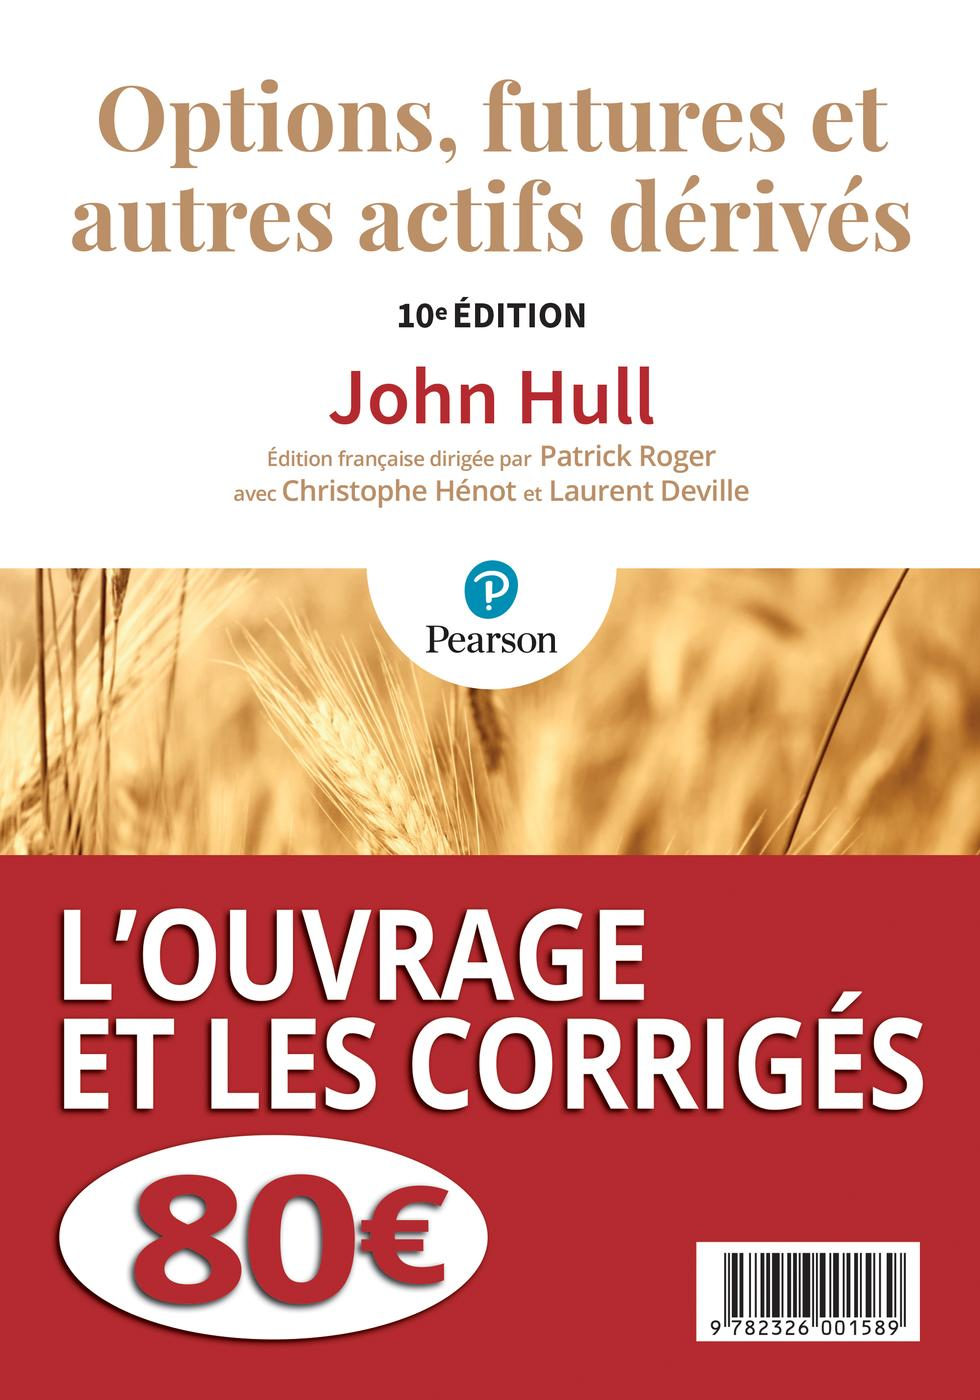 Options Futures Et Autres Actifs Derives J Hull 10eme Edition Librairie Eyrolles